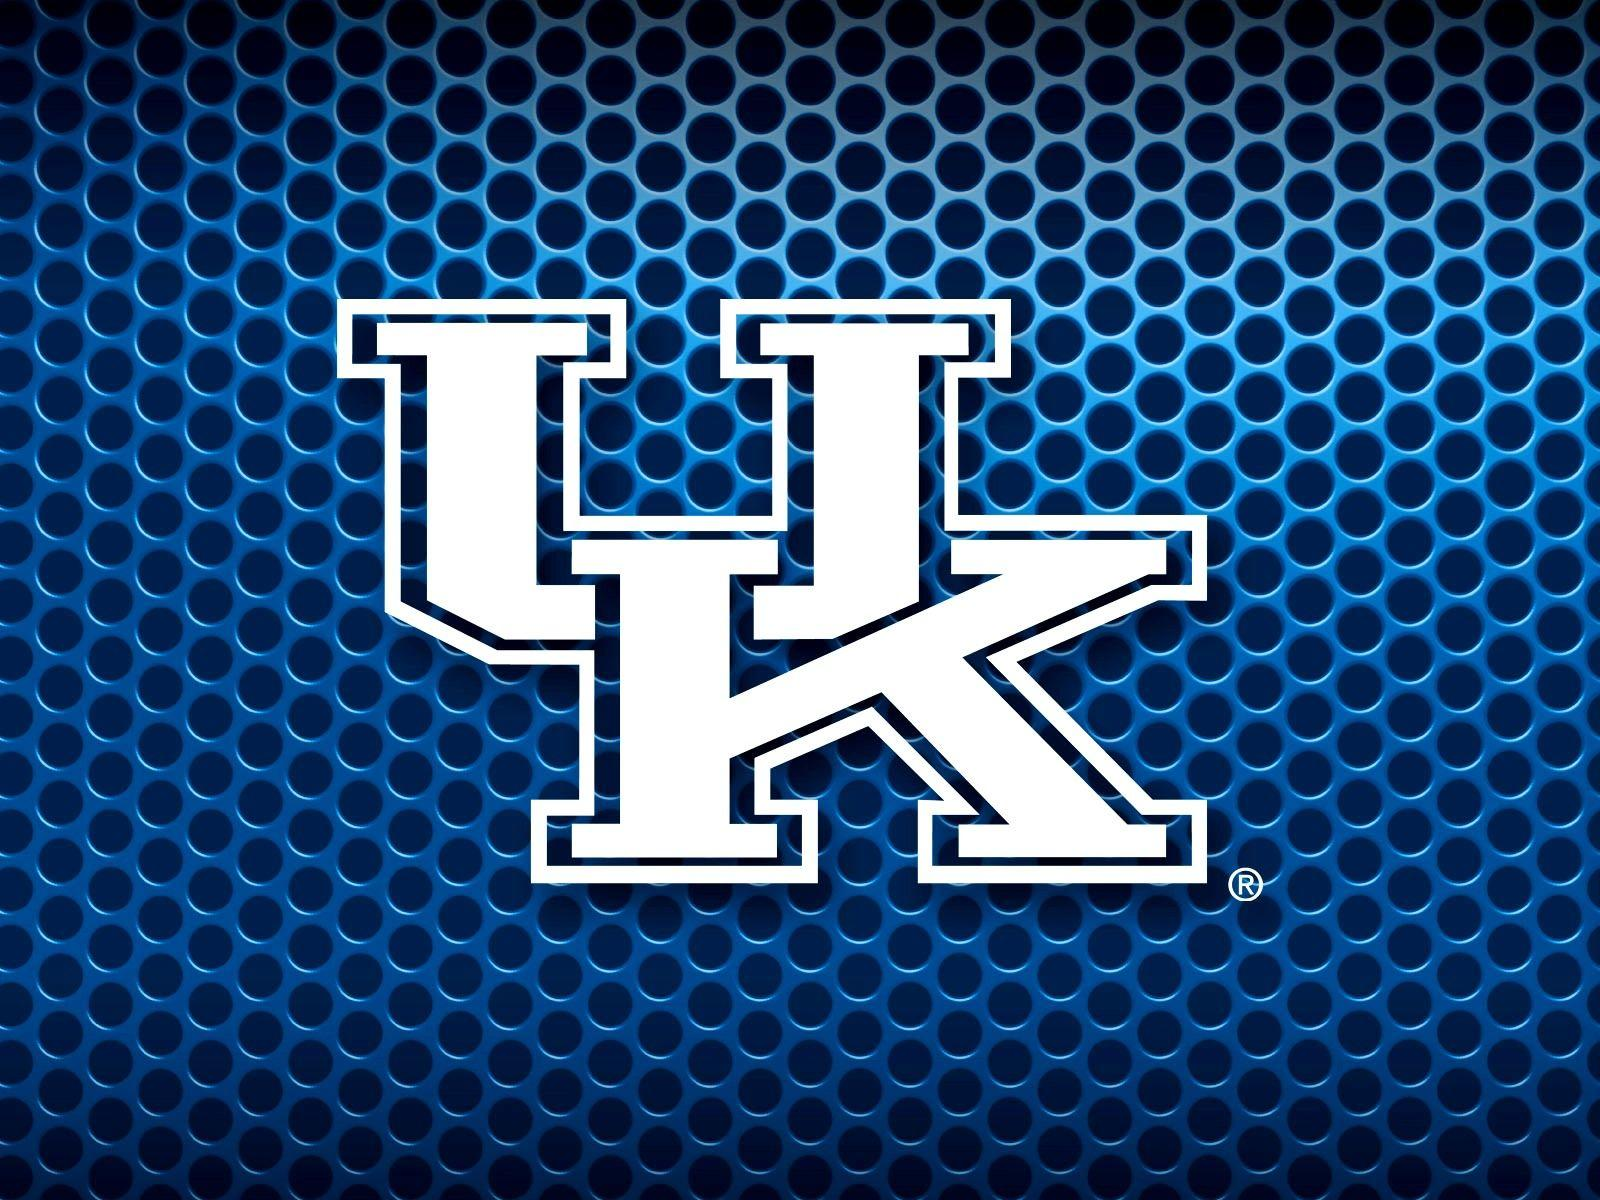 Kentucky Screensavers And Wallpaper: NBA Team Logos Wallpapers 2015